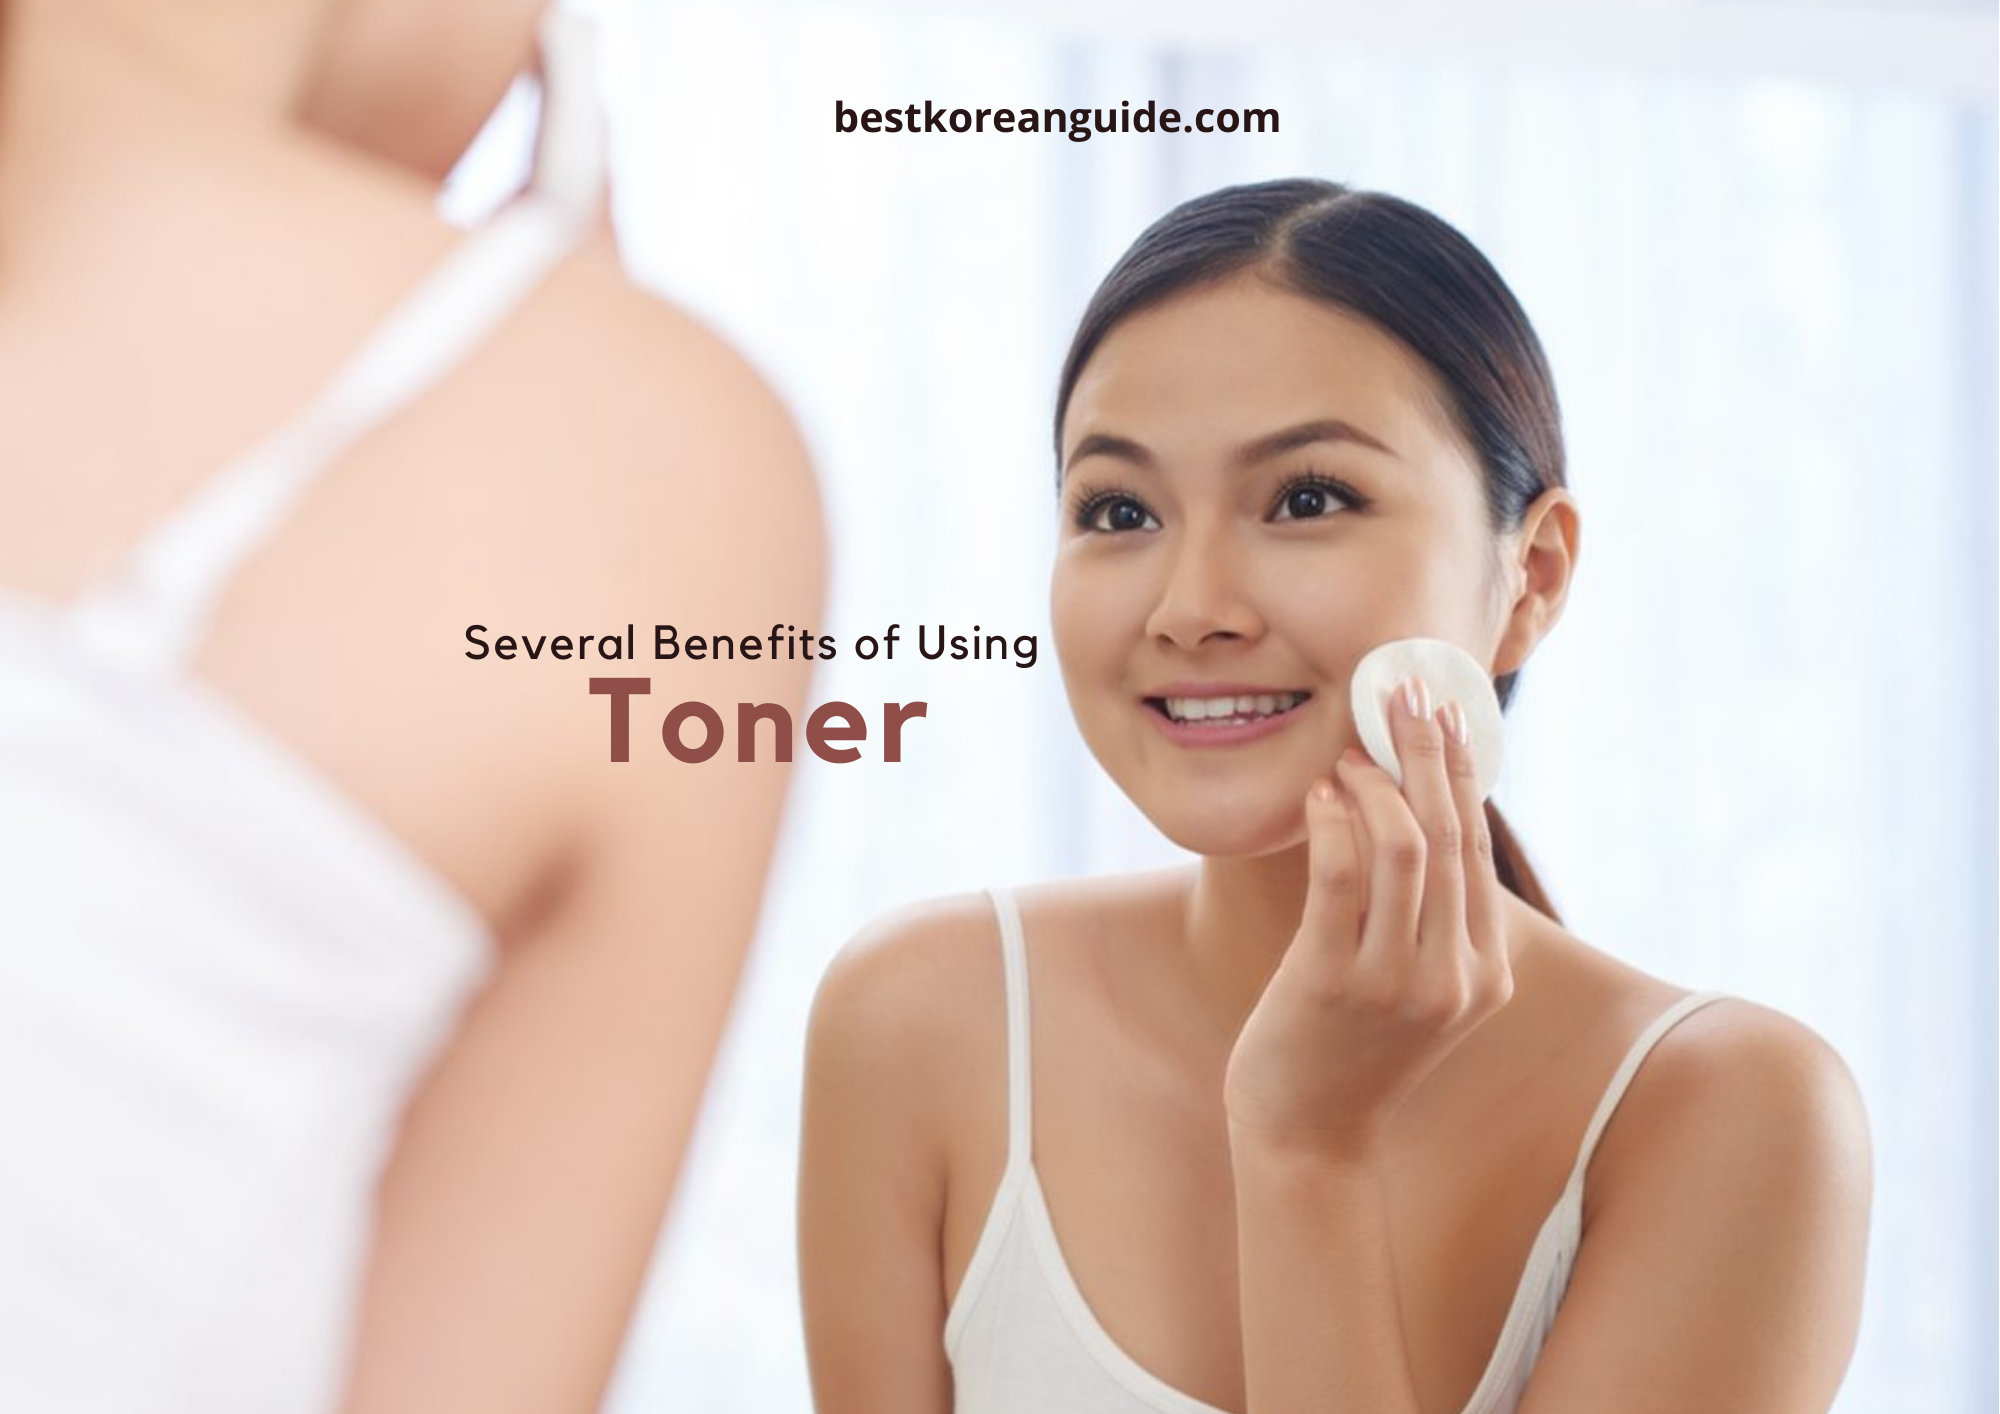 Several Benefits of Using Toner